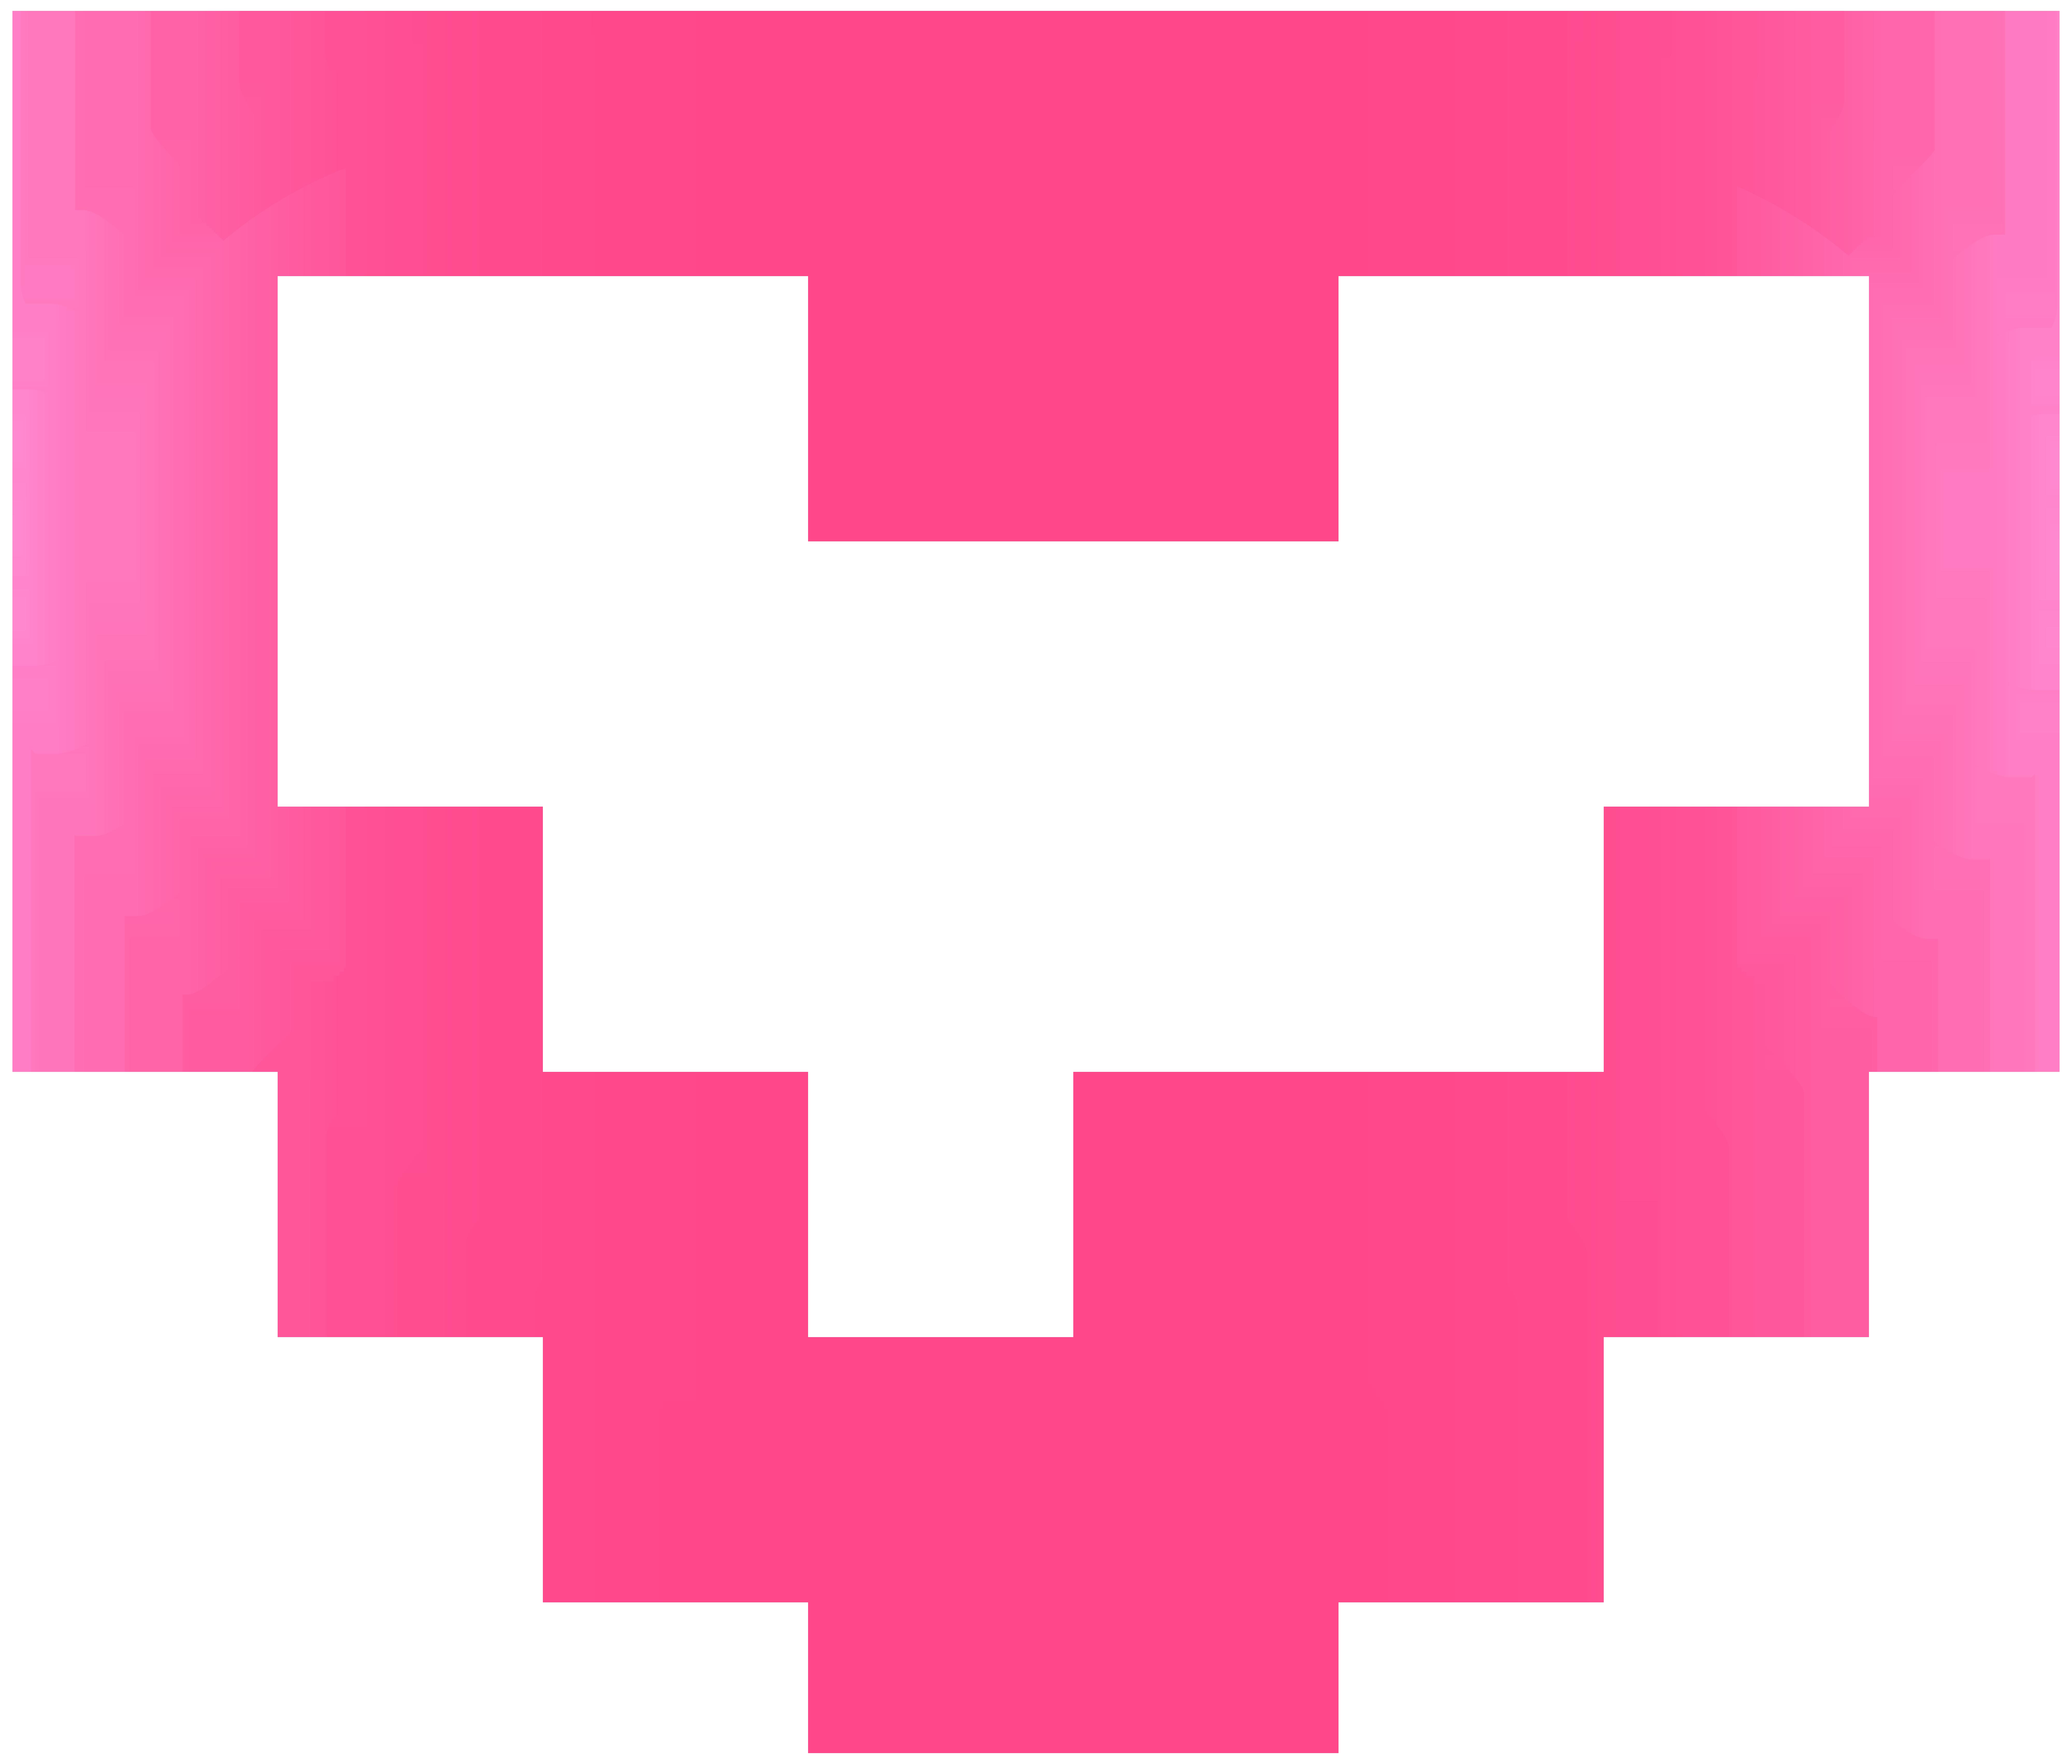 Frame clipart shape. Crafty heart border watercolor